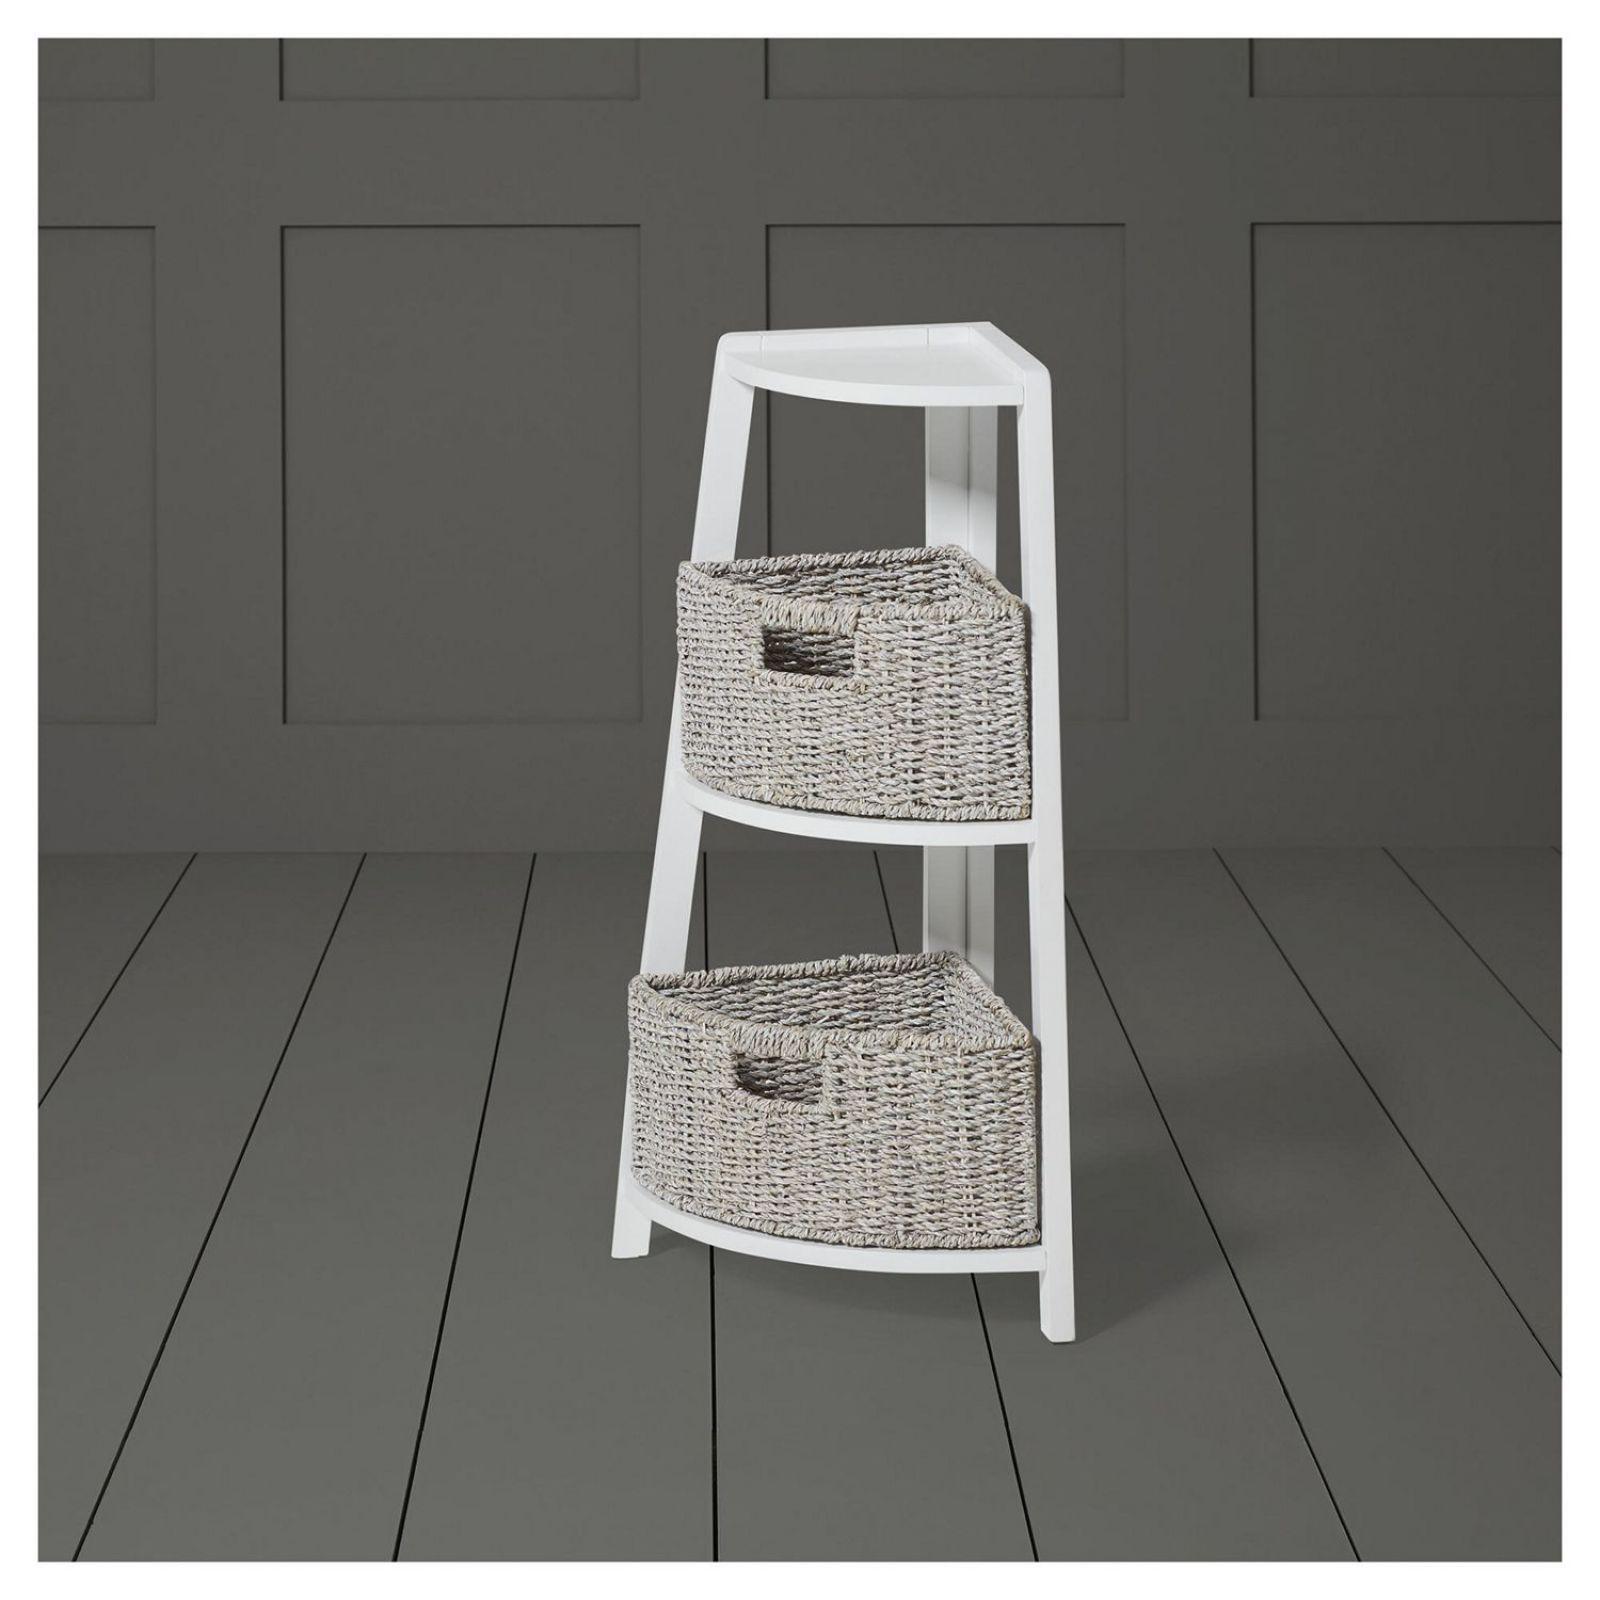 New Tesco 3 Tier Bathroom Corner Unit With Storage Baskets